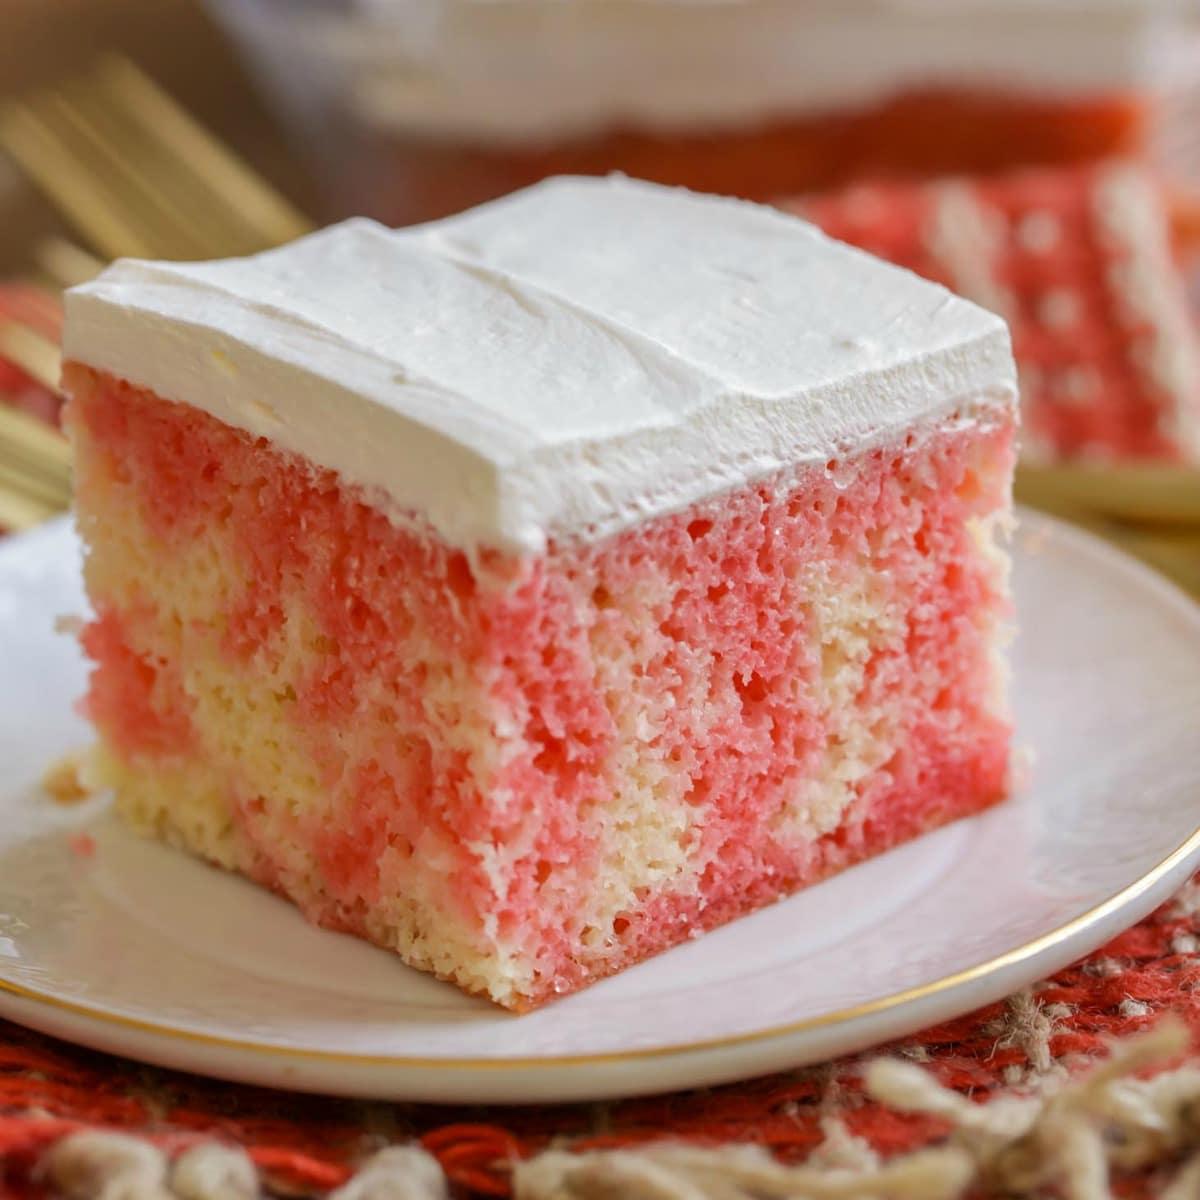 Jello Poke Cake Recipe Works With Any Flavor Of Jello Lil Luna